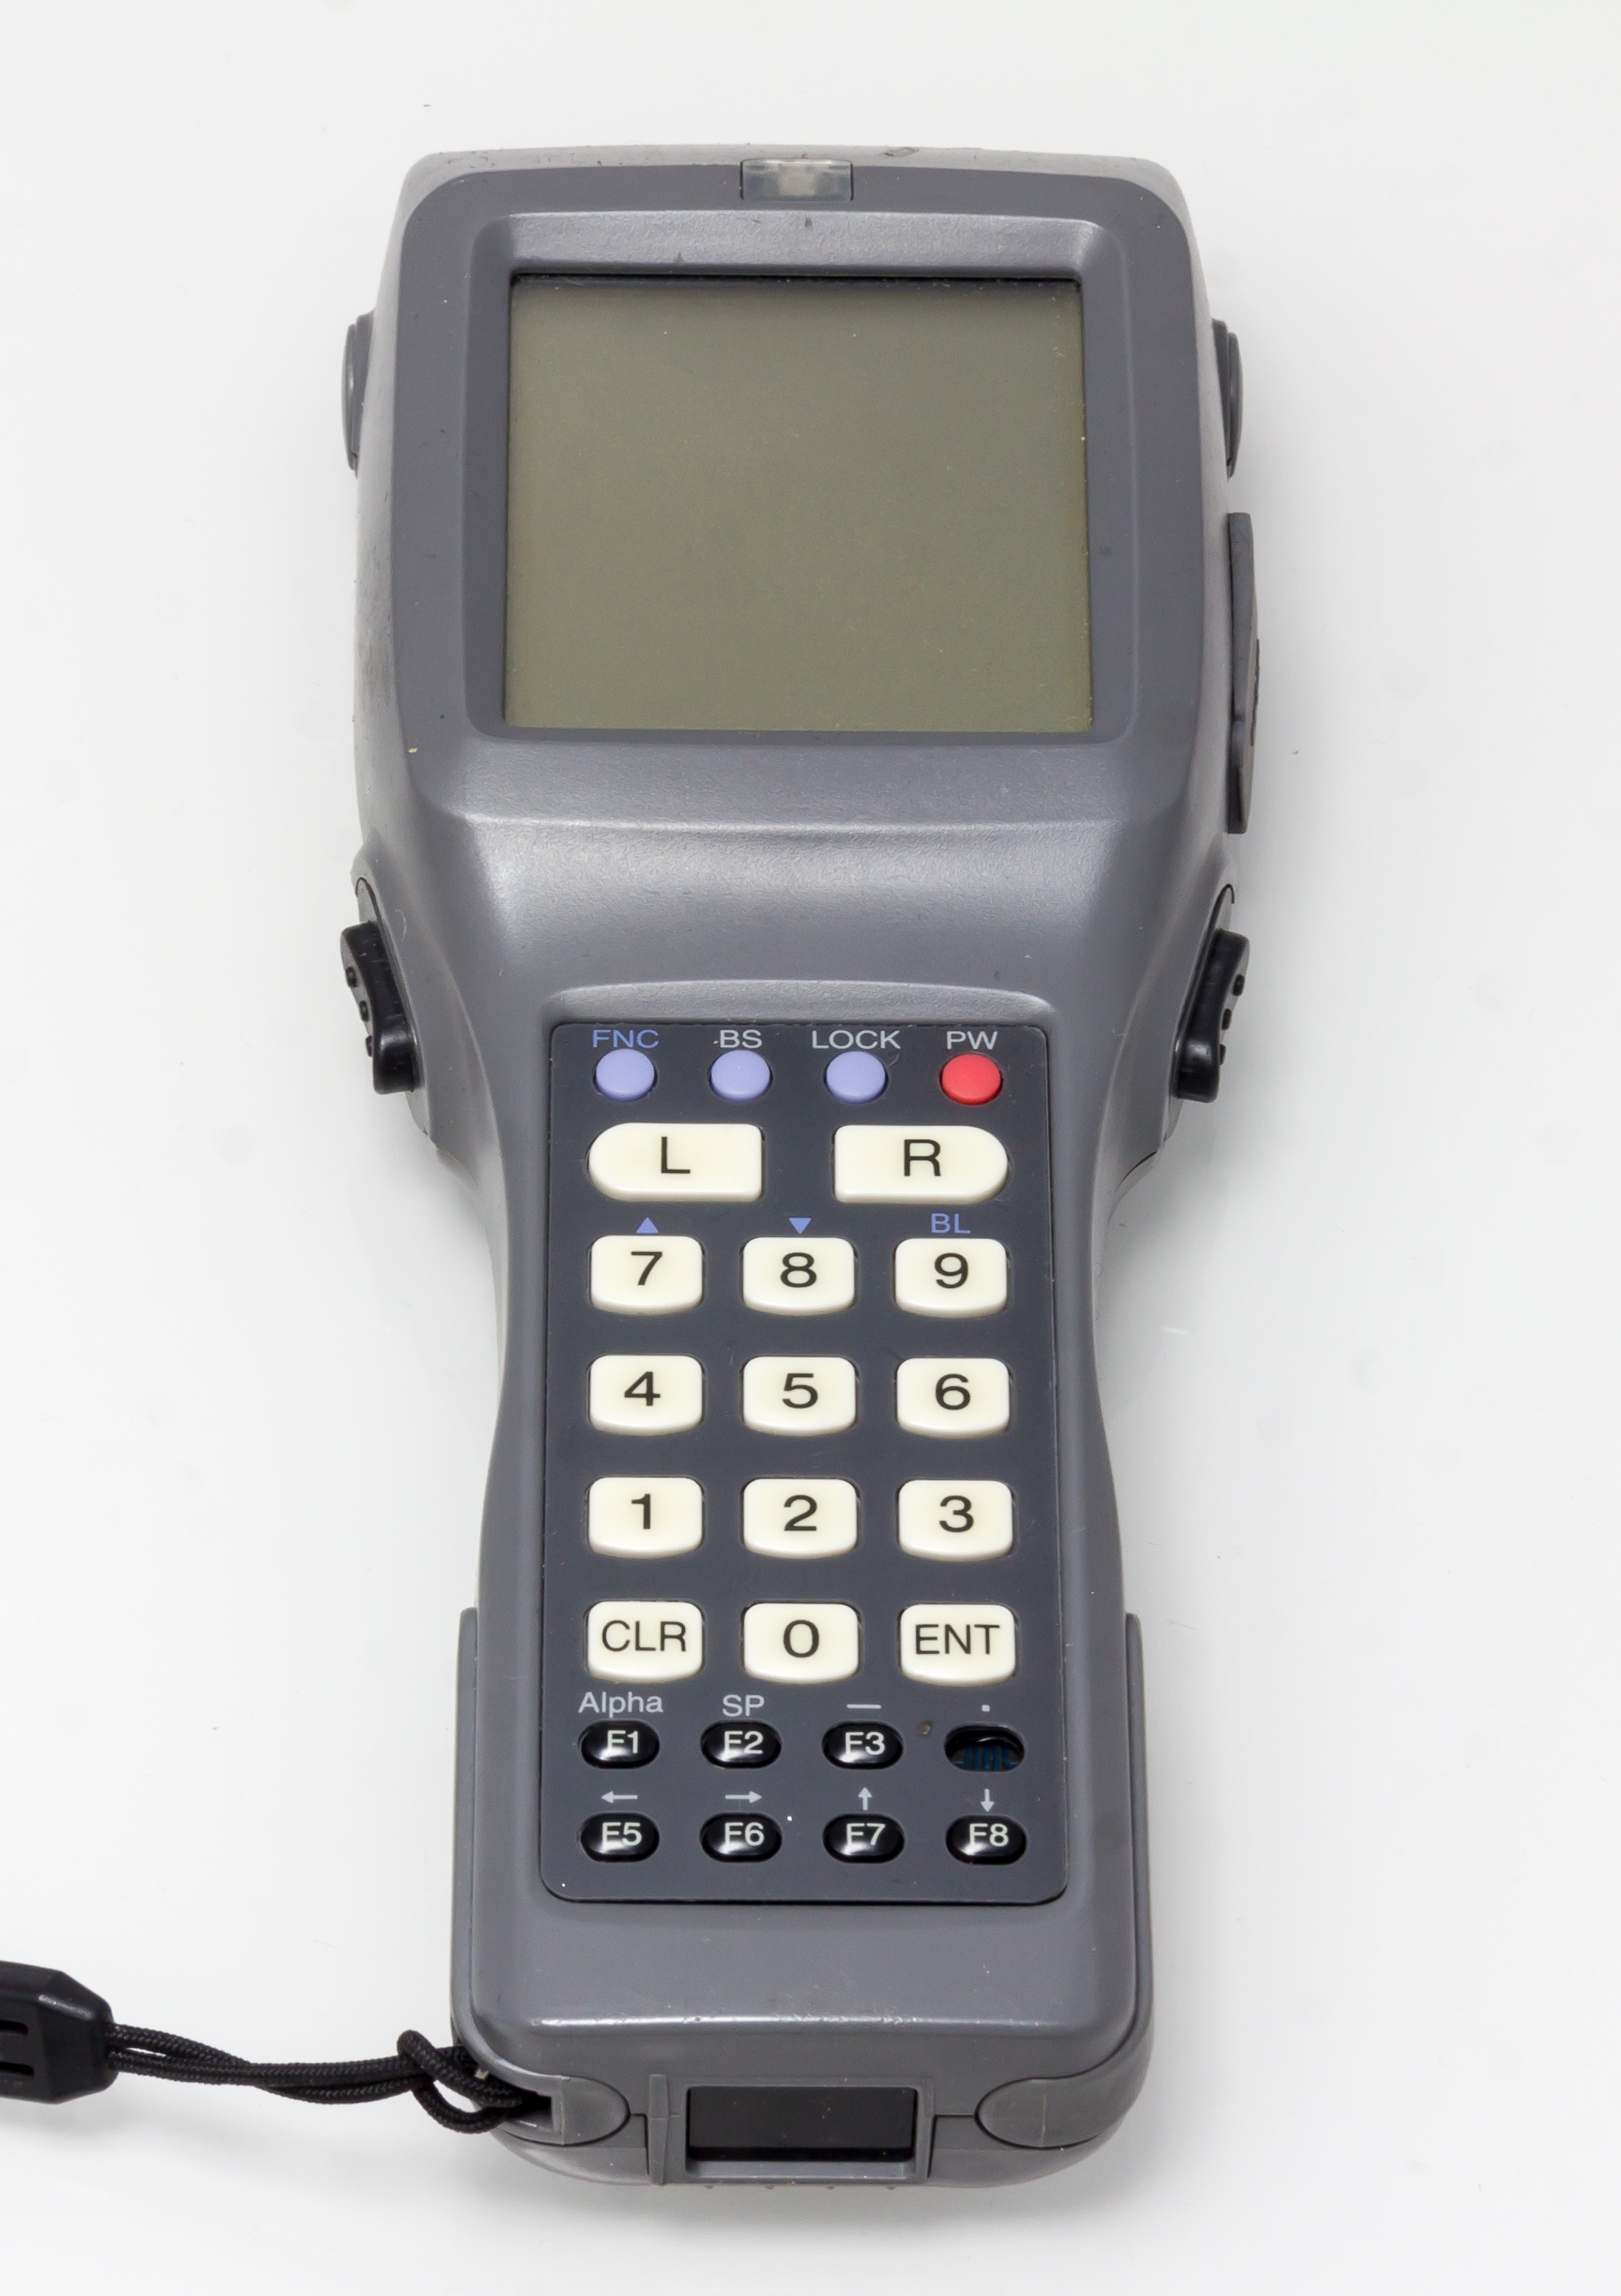 File:Barcode scanner Casio DT-800M70E-1112.jpg